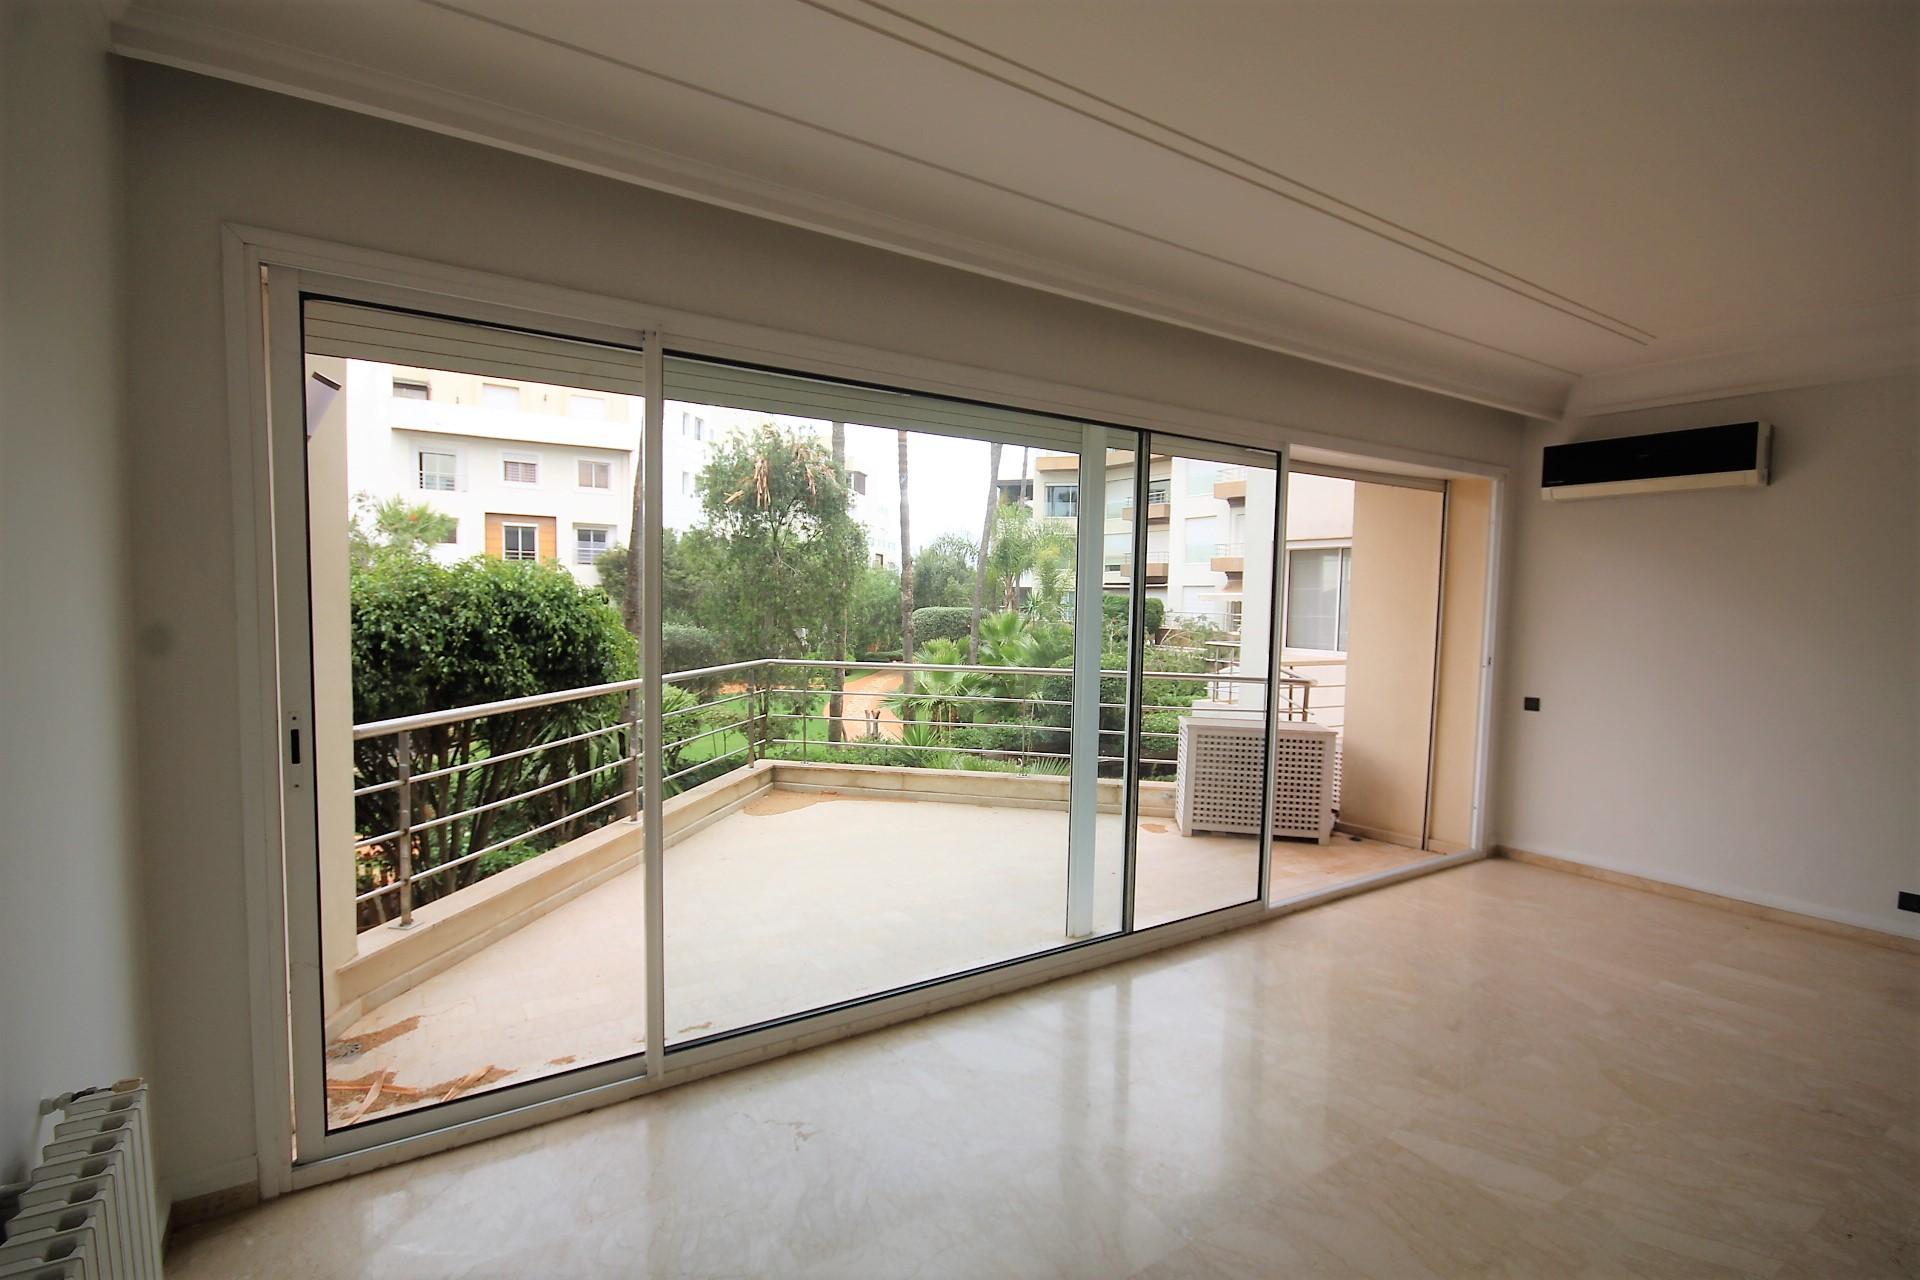 Casablanca, Ain Diab loue confortable appartement vue mer, terrasse, 200 m²